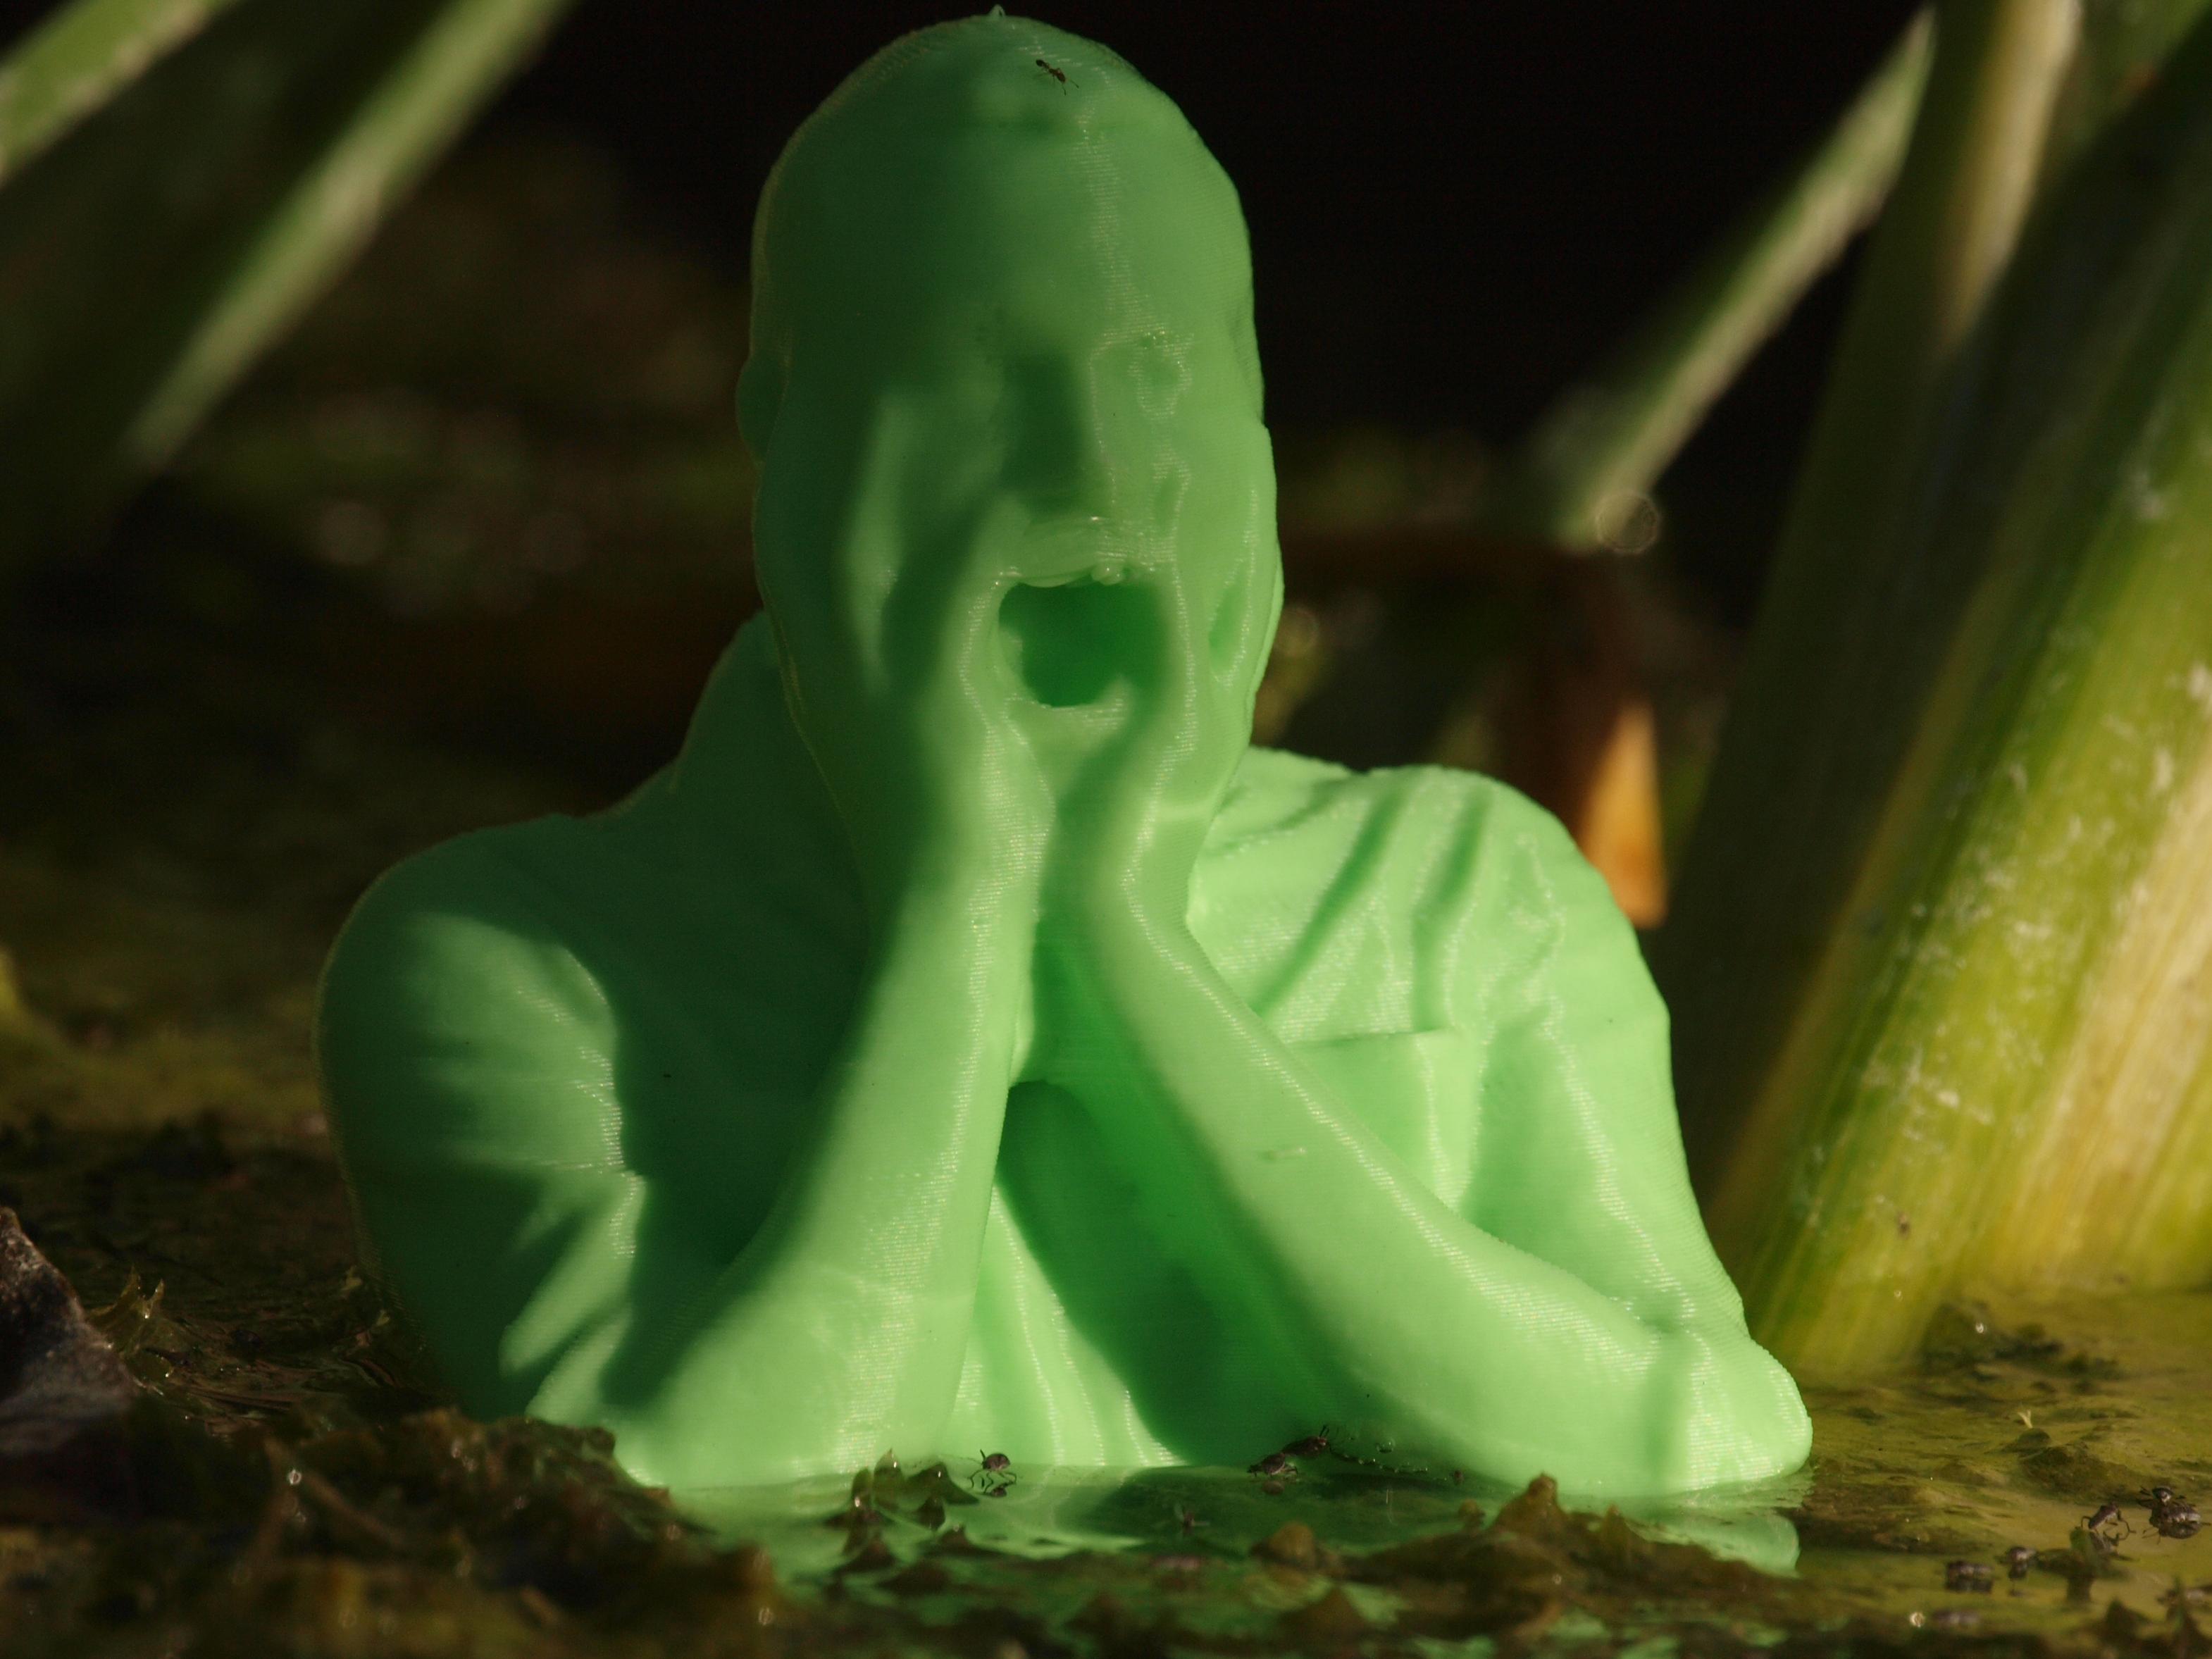 Sinking - 3D Print, thing:31170